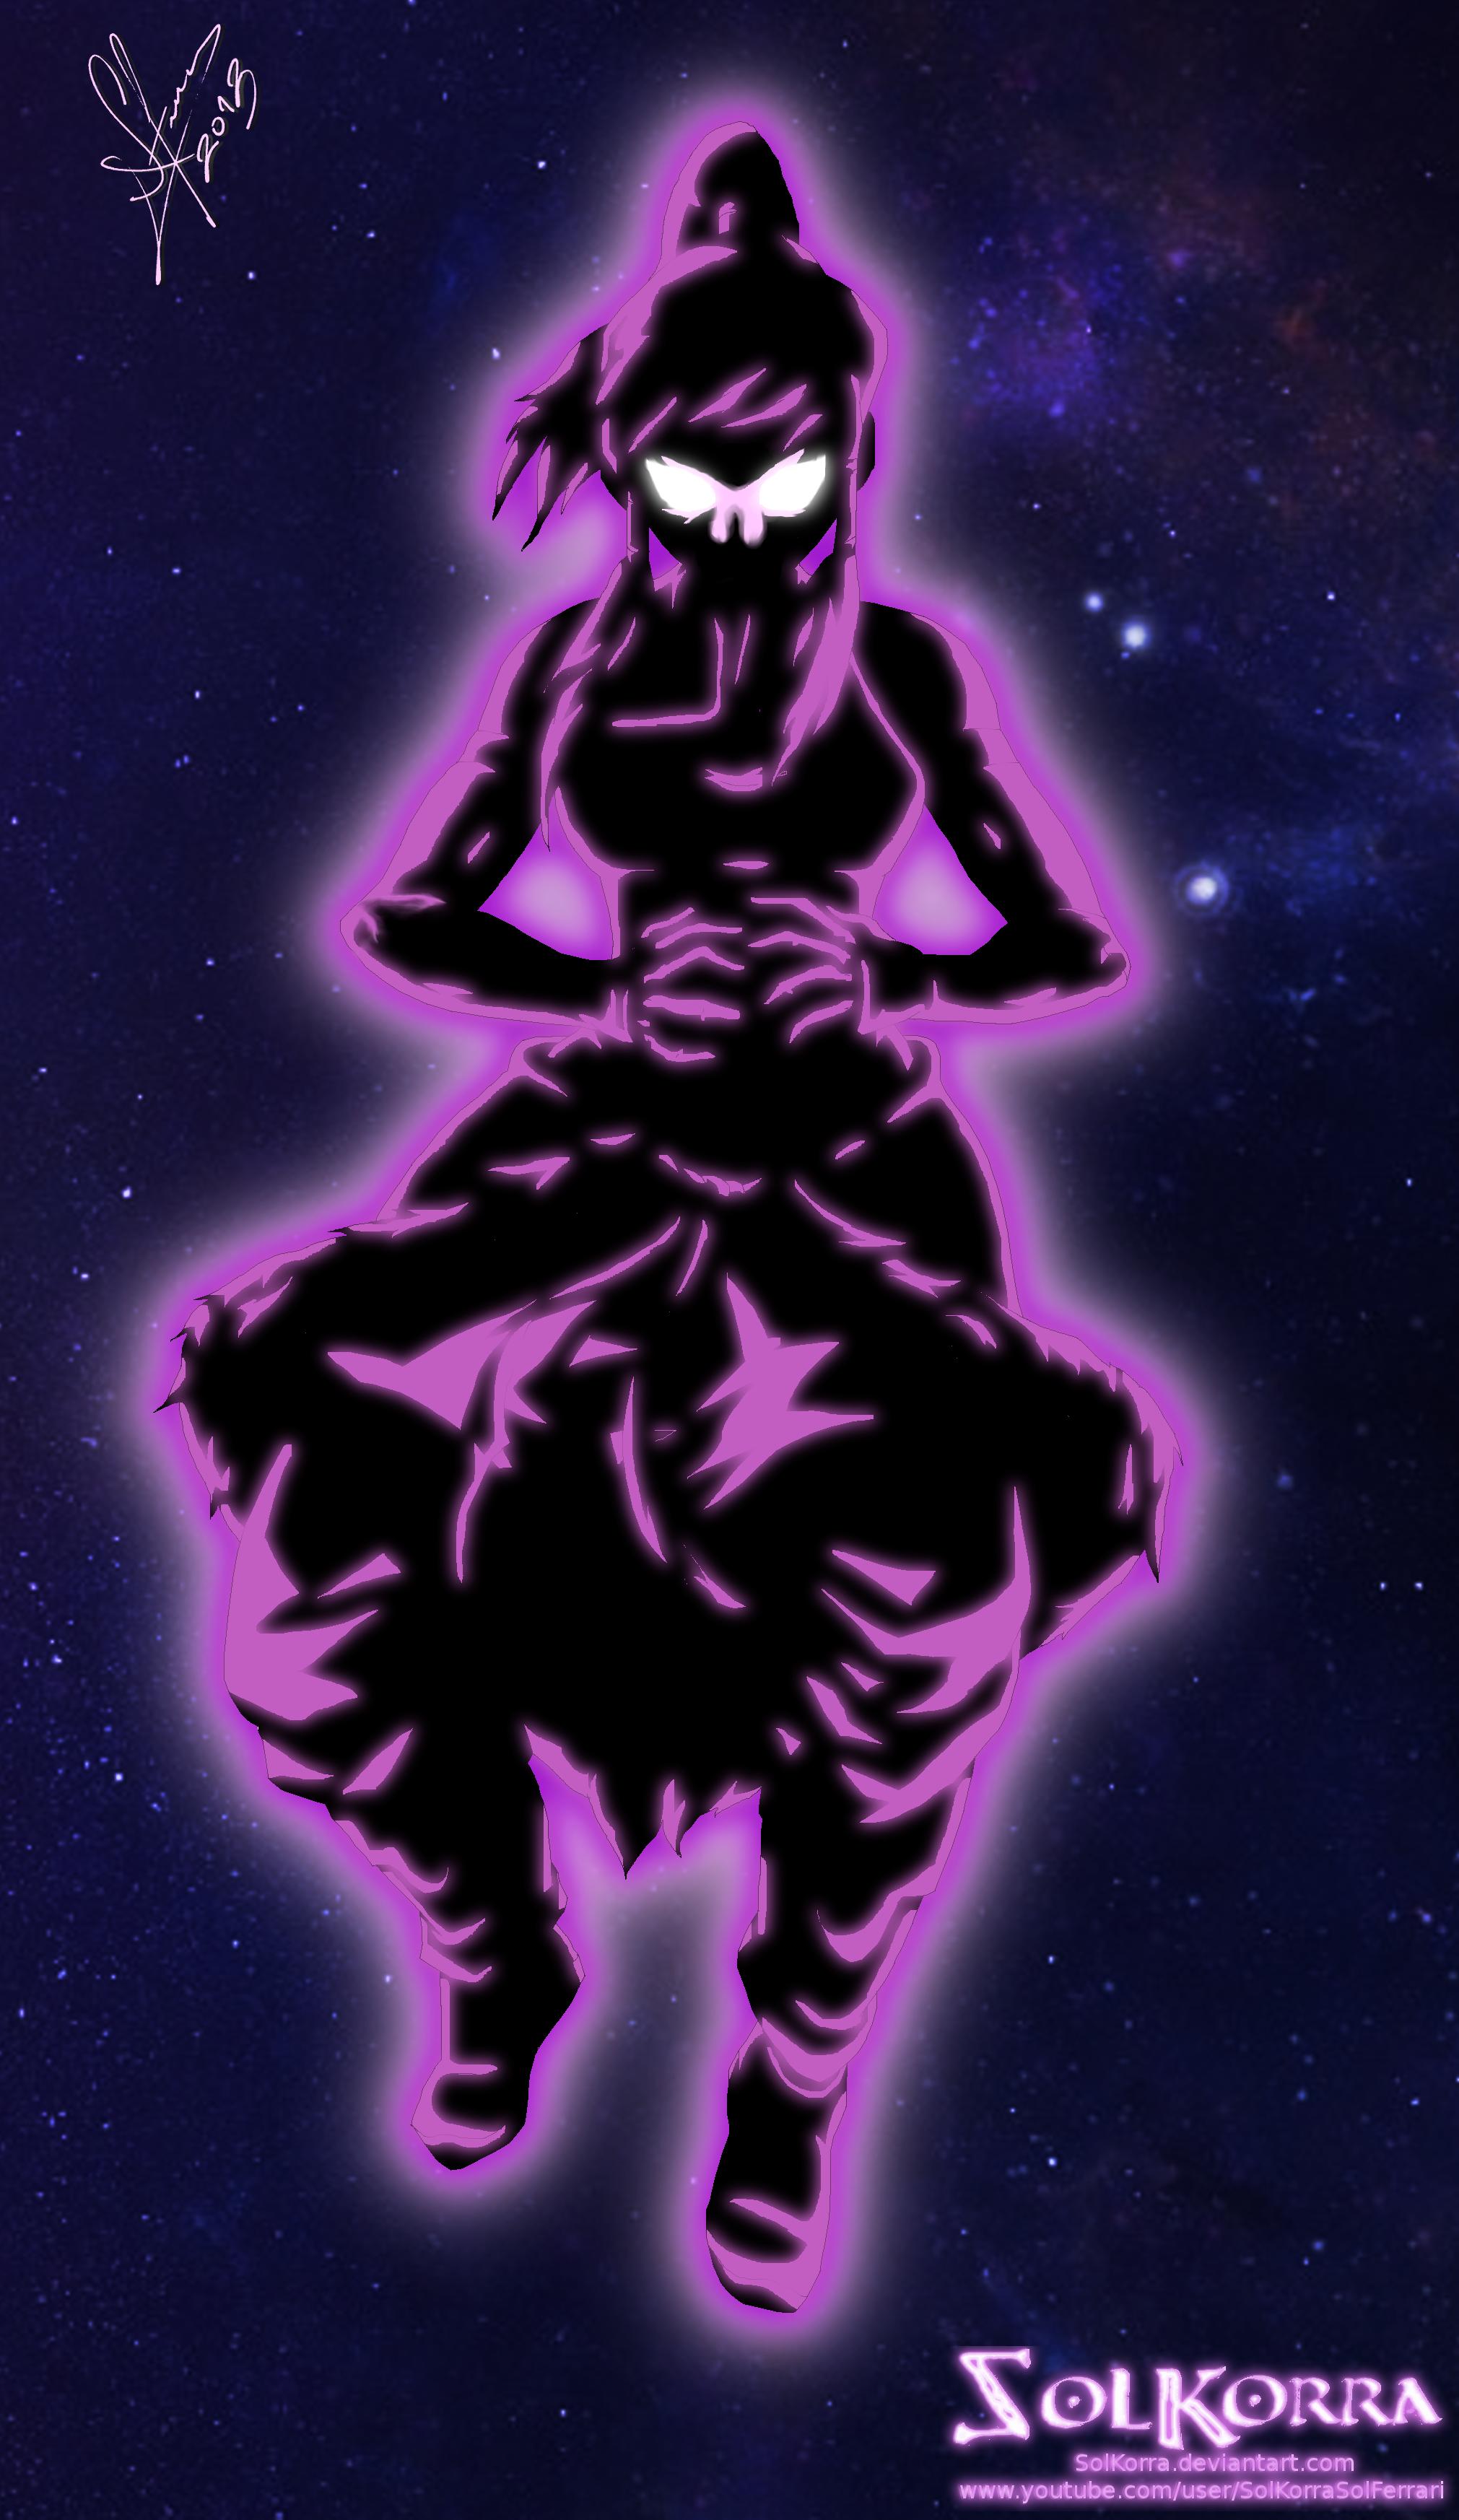 Korra Cosmic Energy by SolKorra